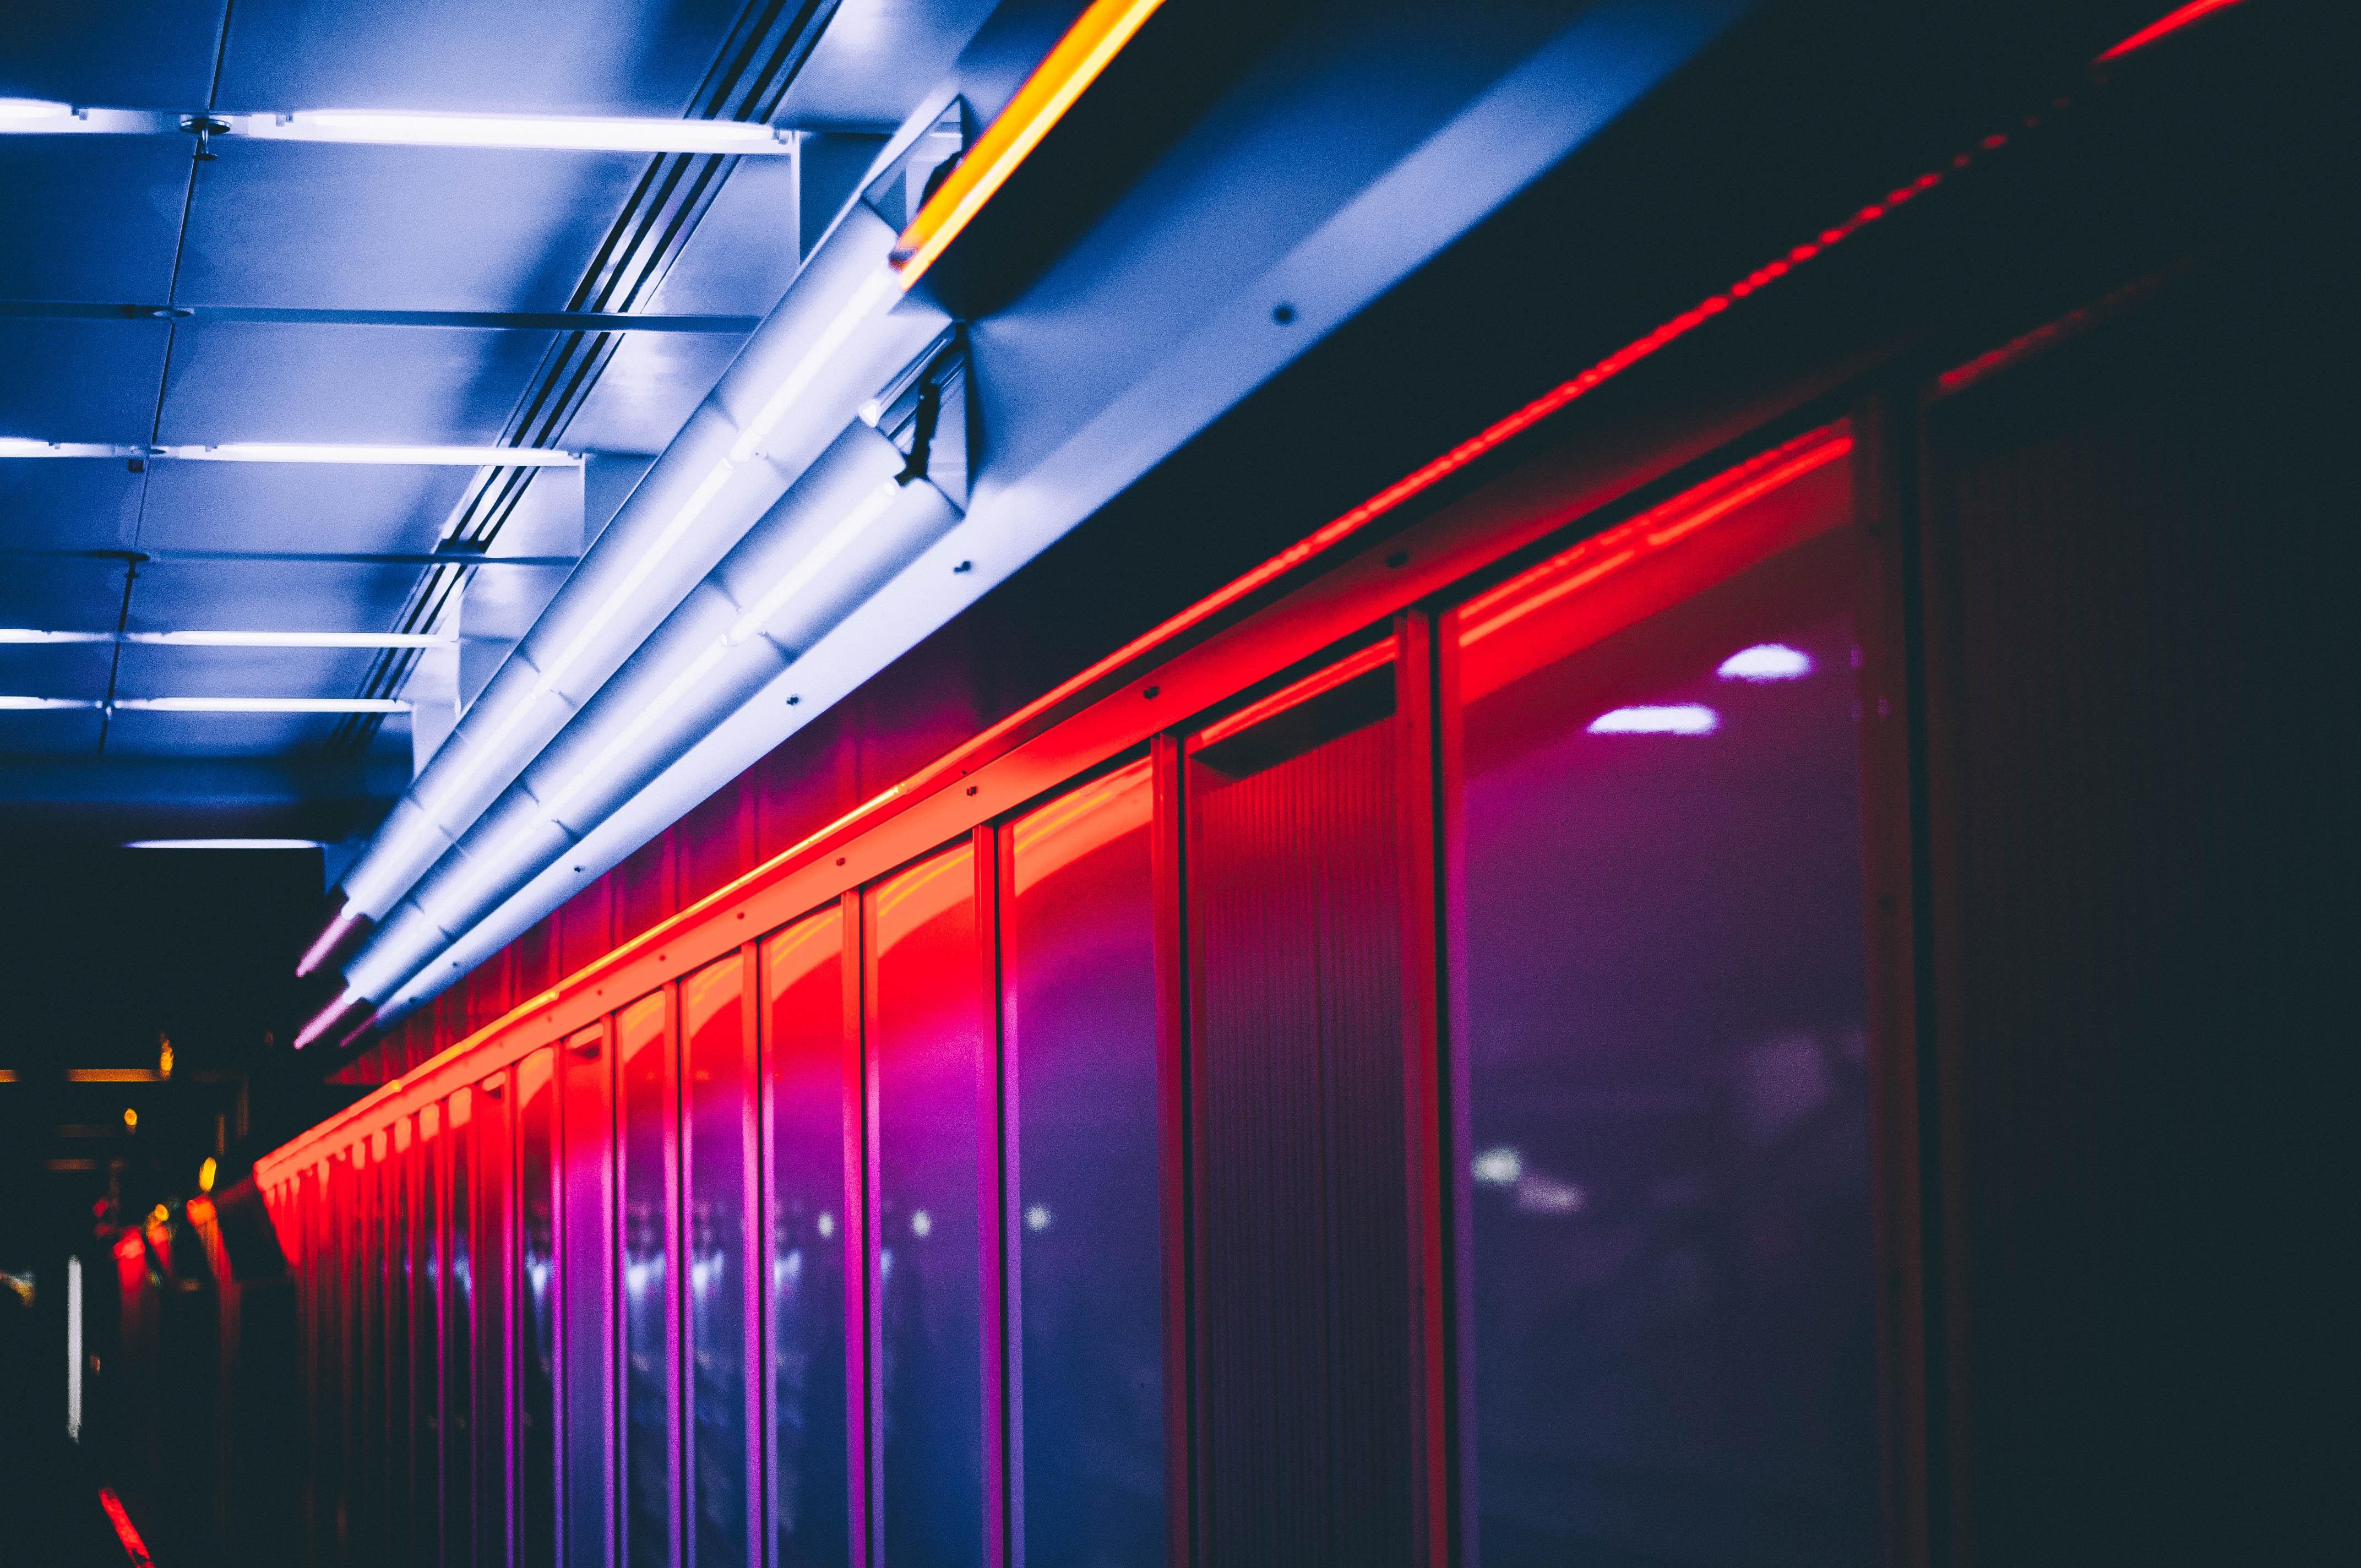 Free Images : light, night, auditorium, line, red, color ...